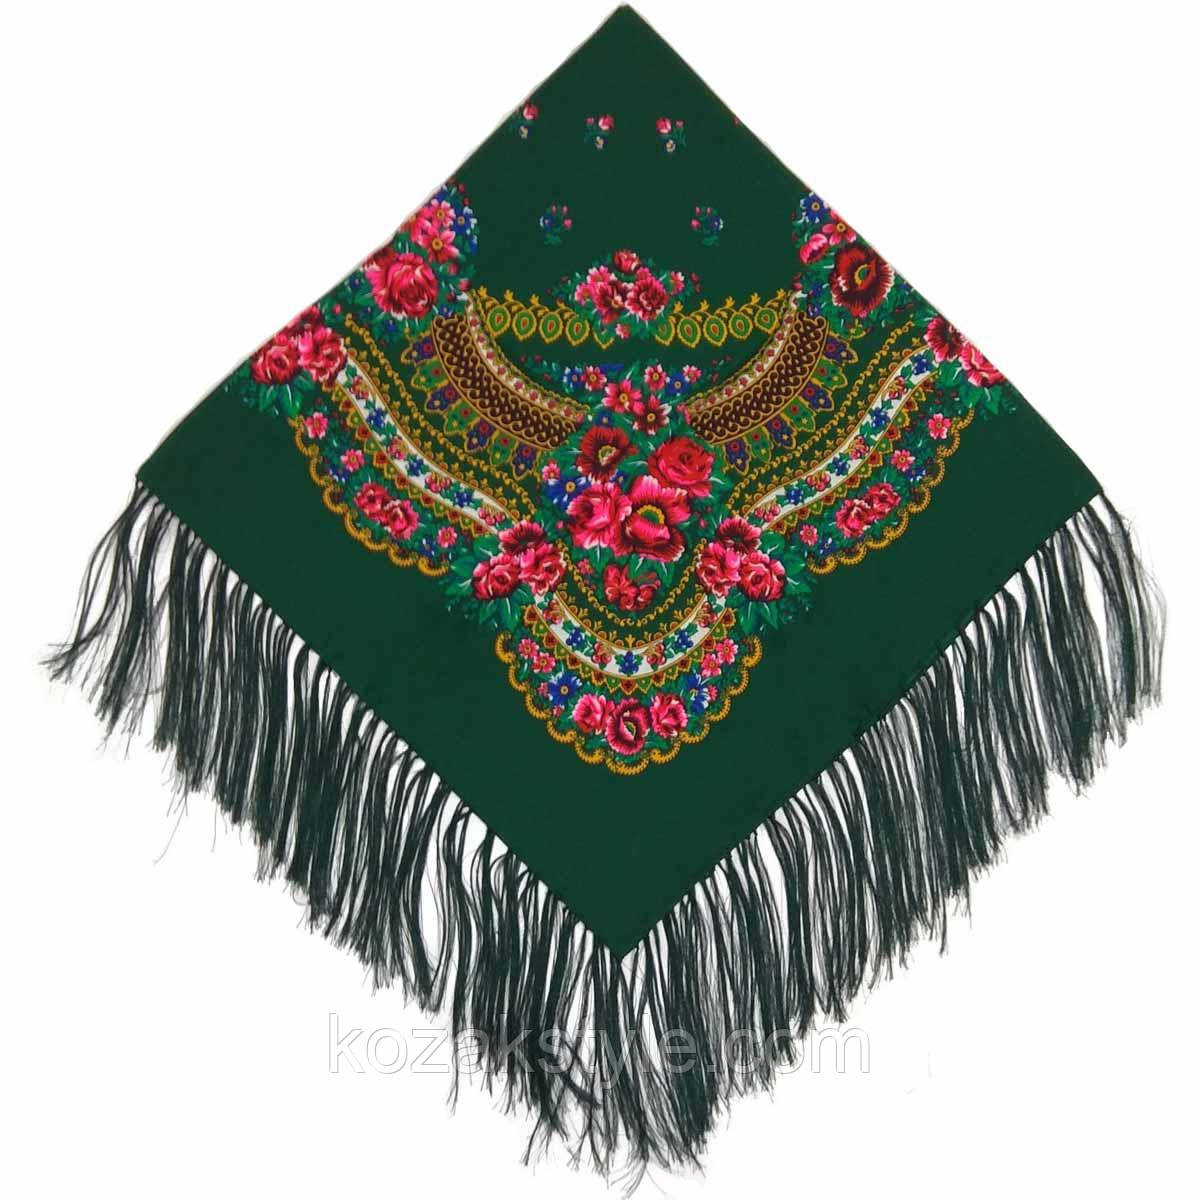 Українська хустка народна зелена (120х120)